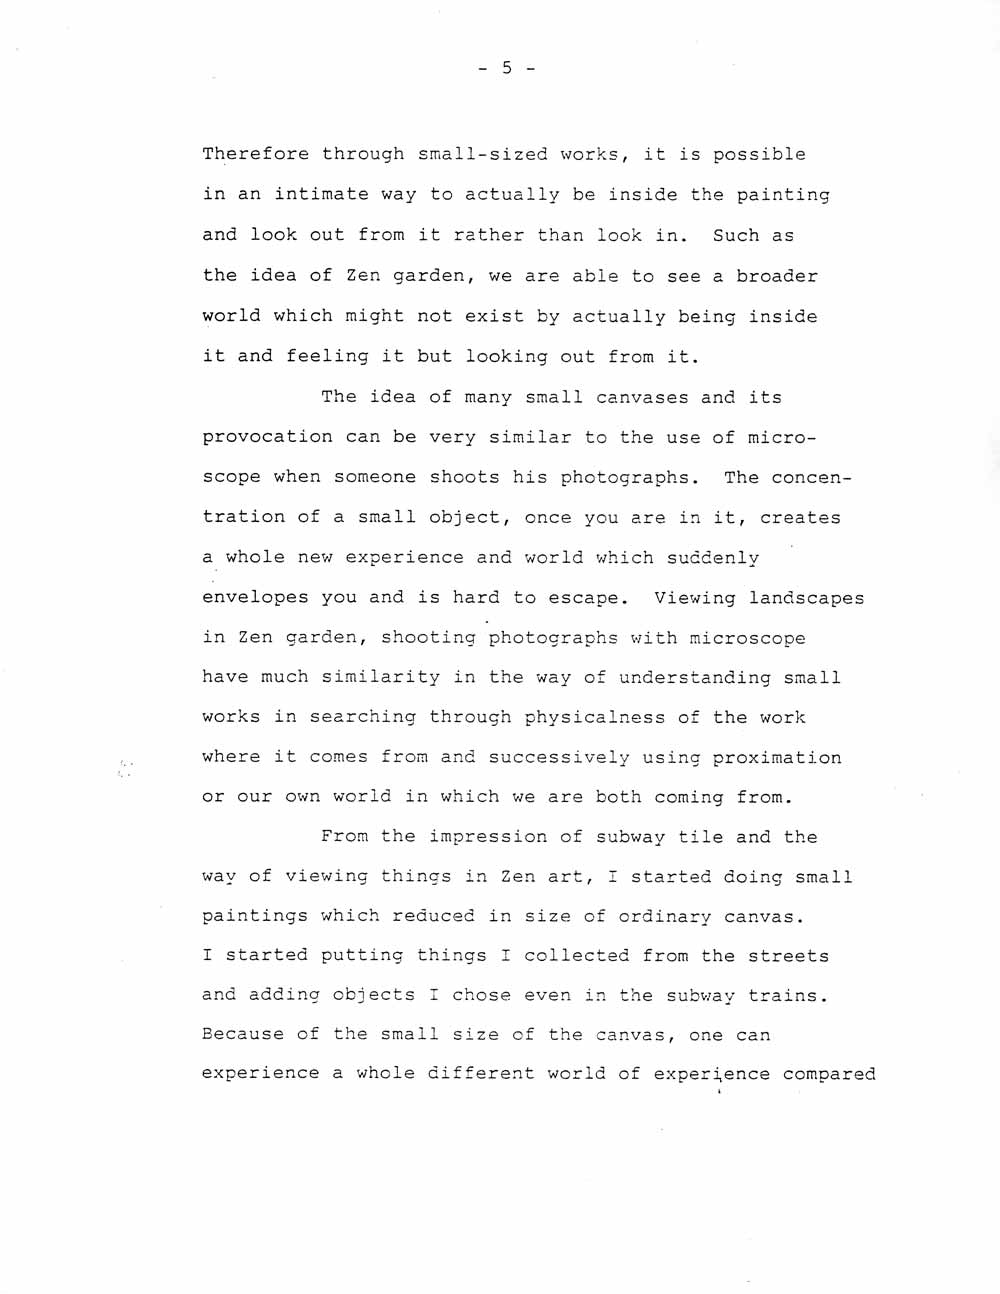 Ik-Joong Kang's Artist Statement, pg 5